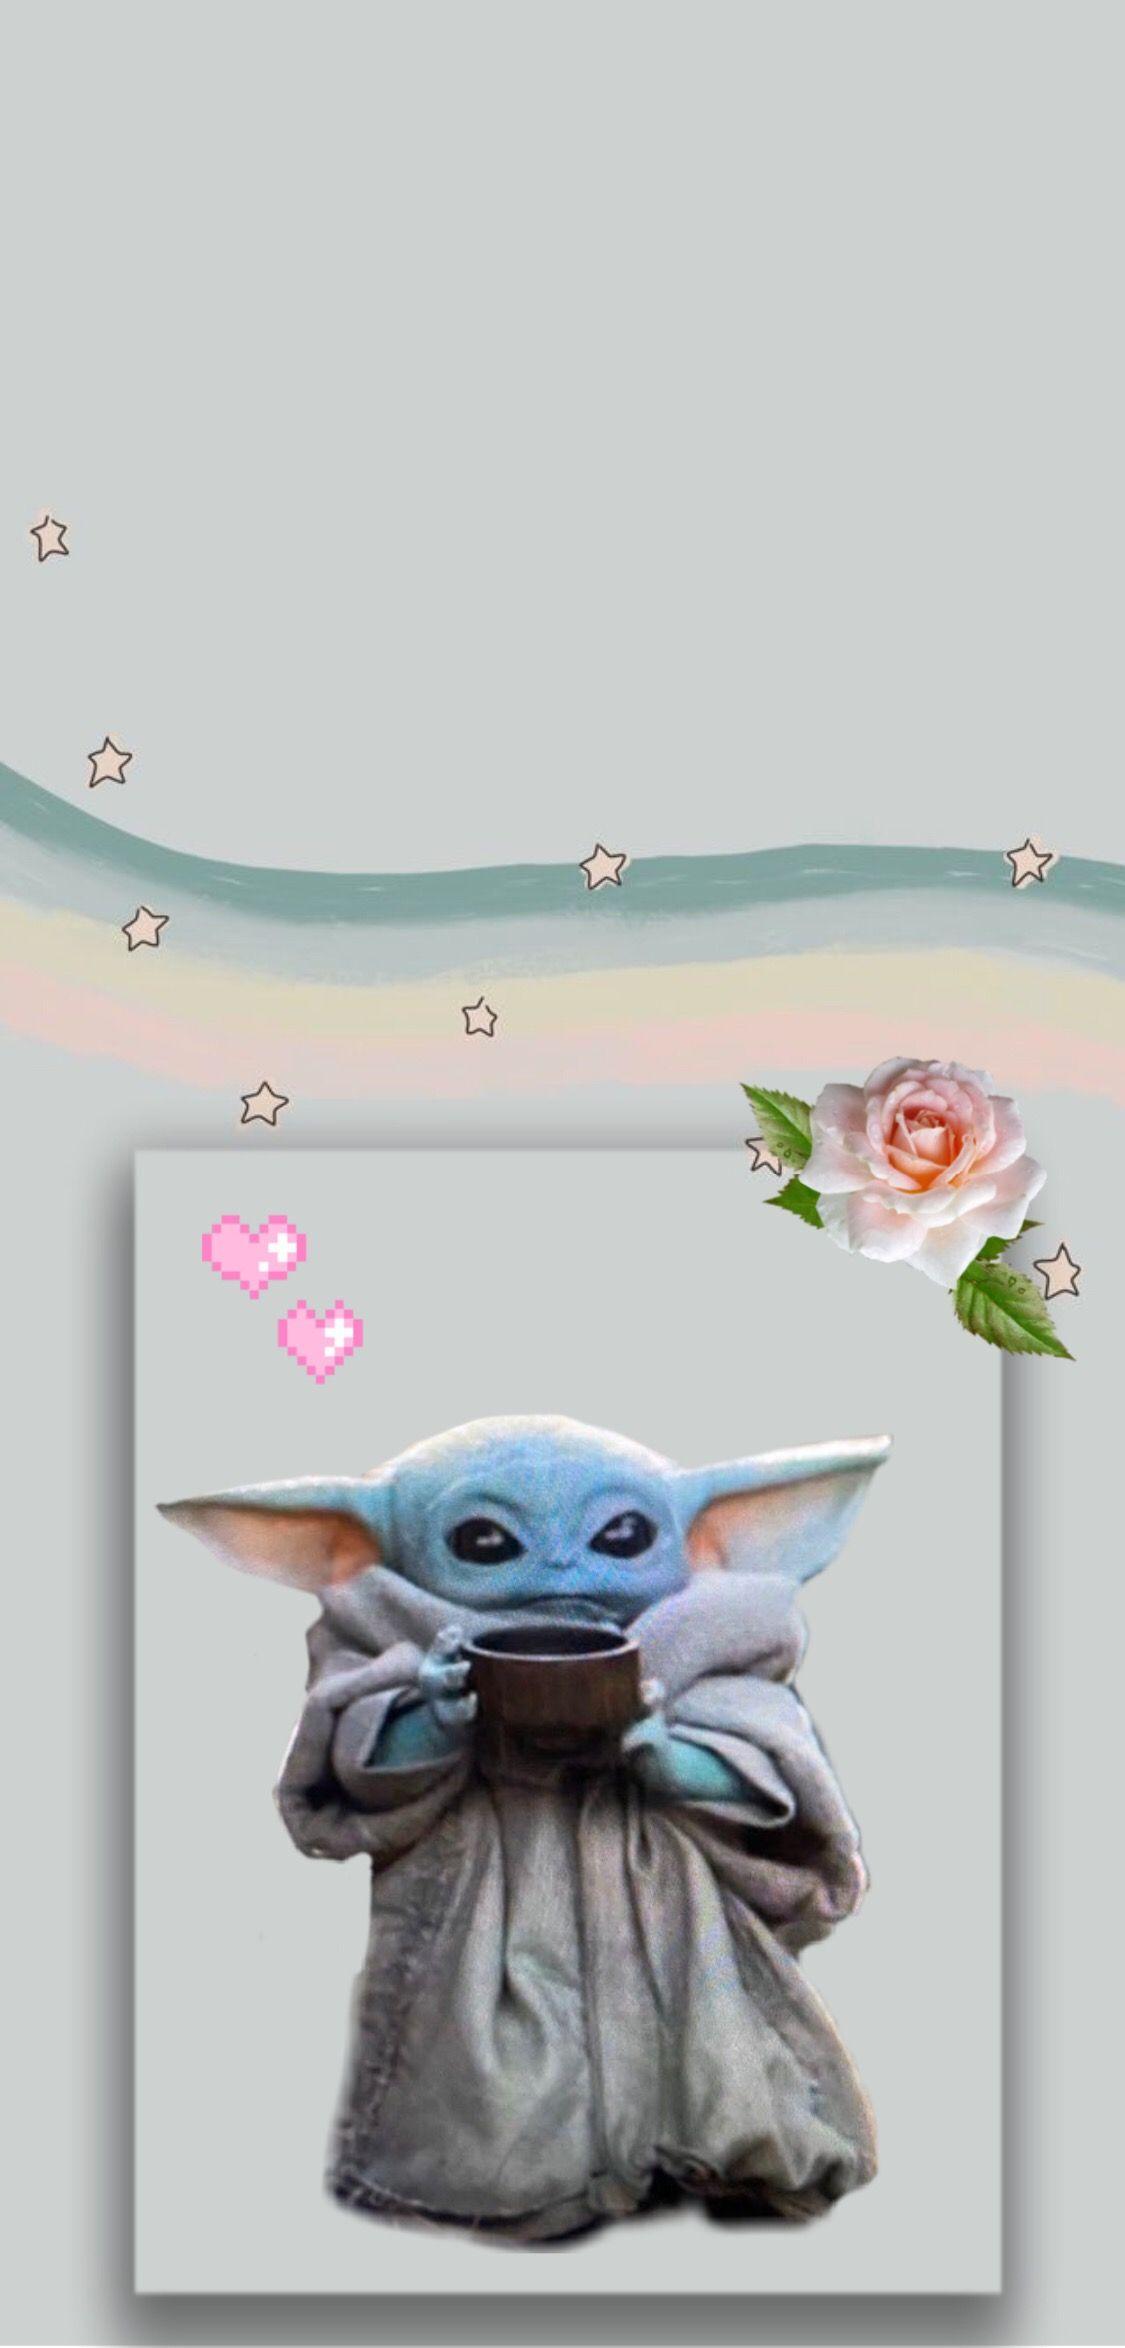 Baby Yoda Yoda Wallpaper Superhero Wall Art Star Wars Awesome